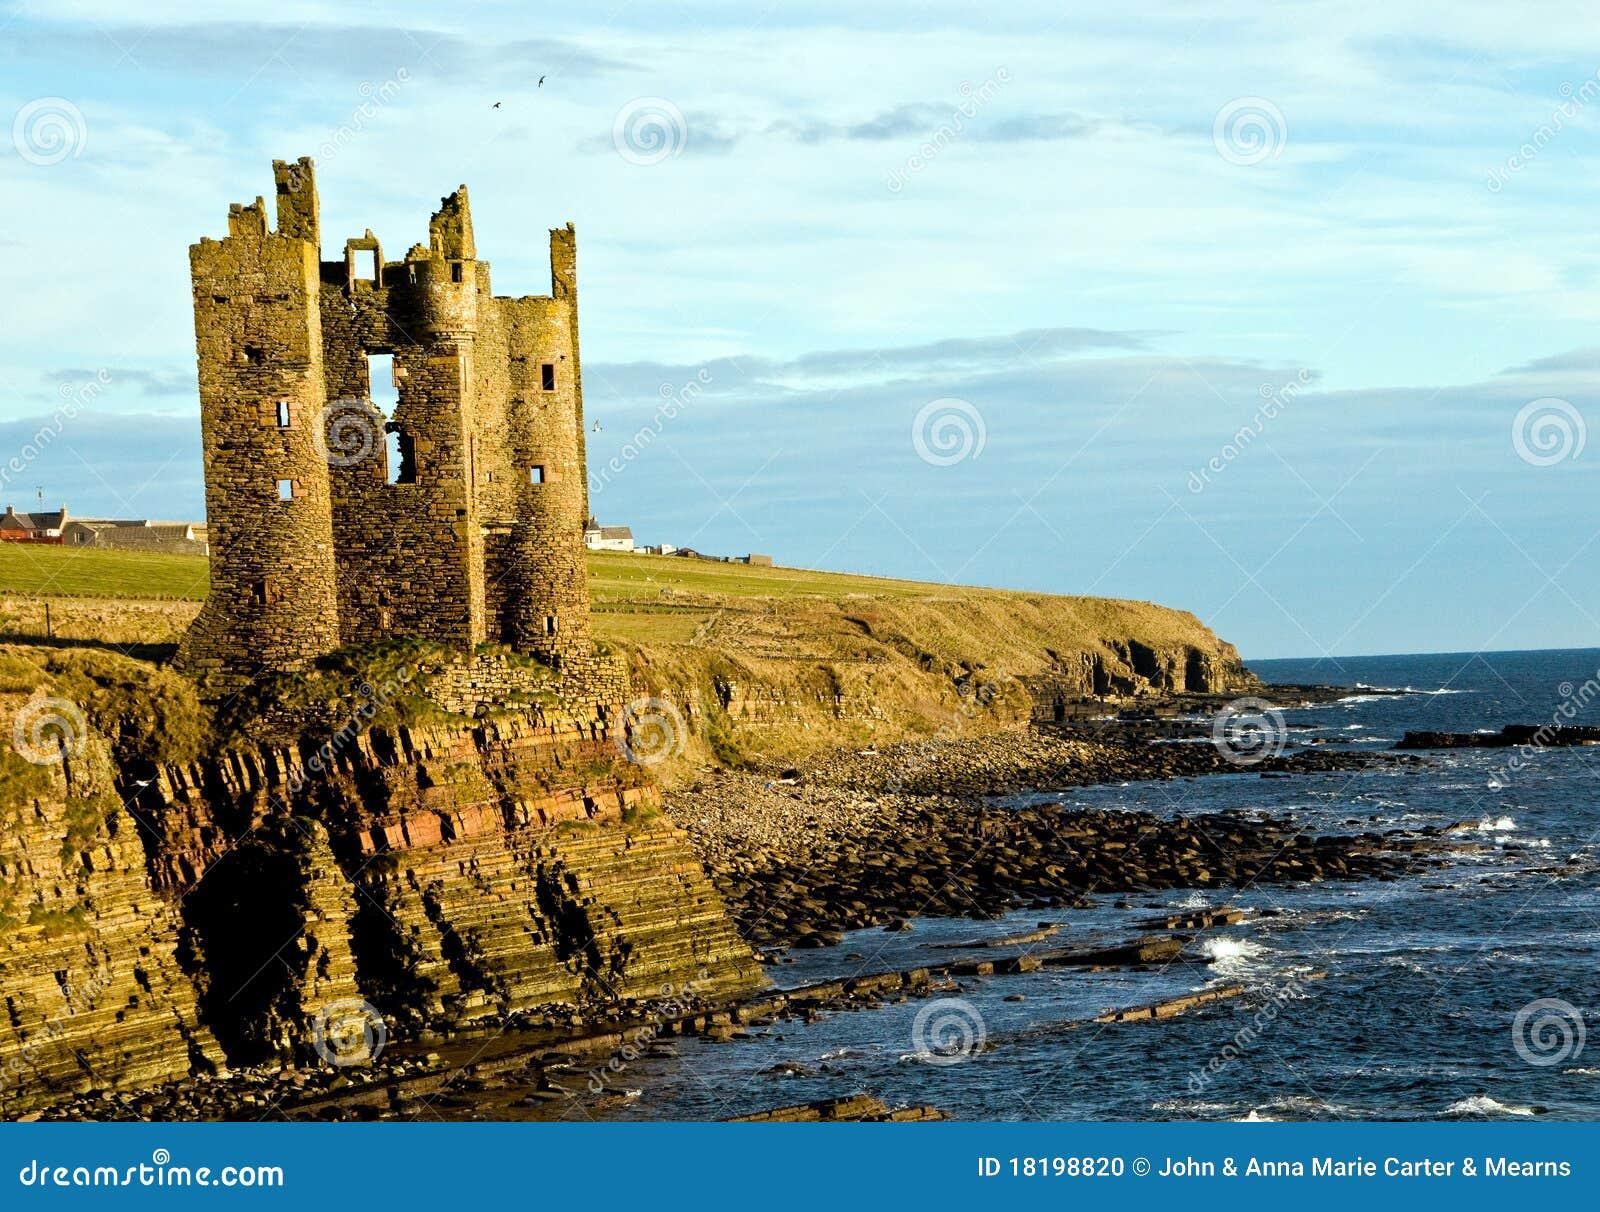 Keiss Castle Ruins